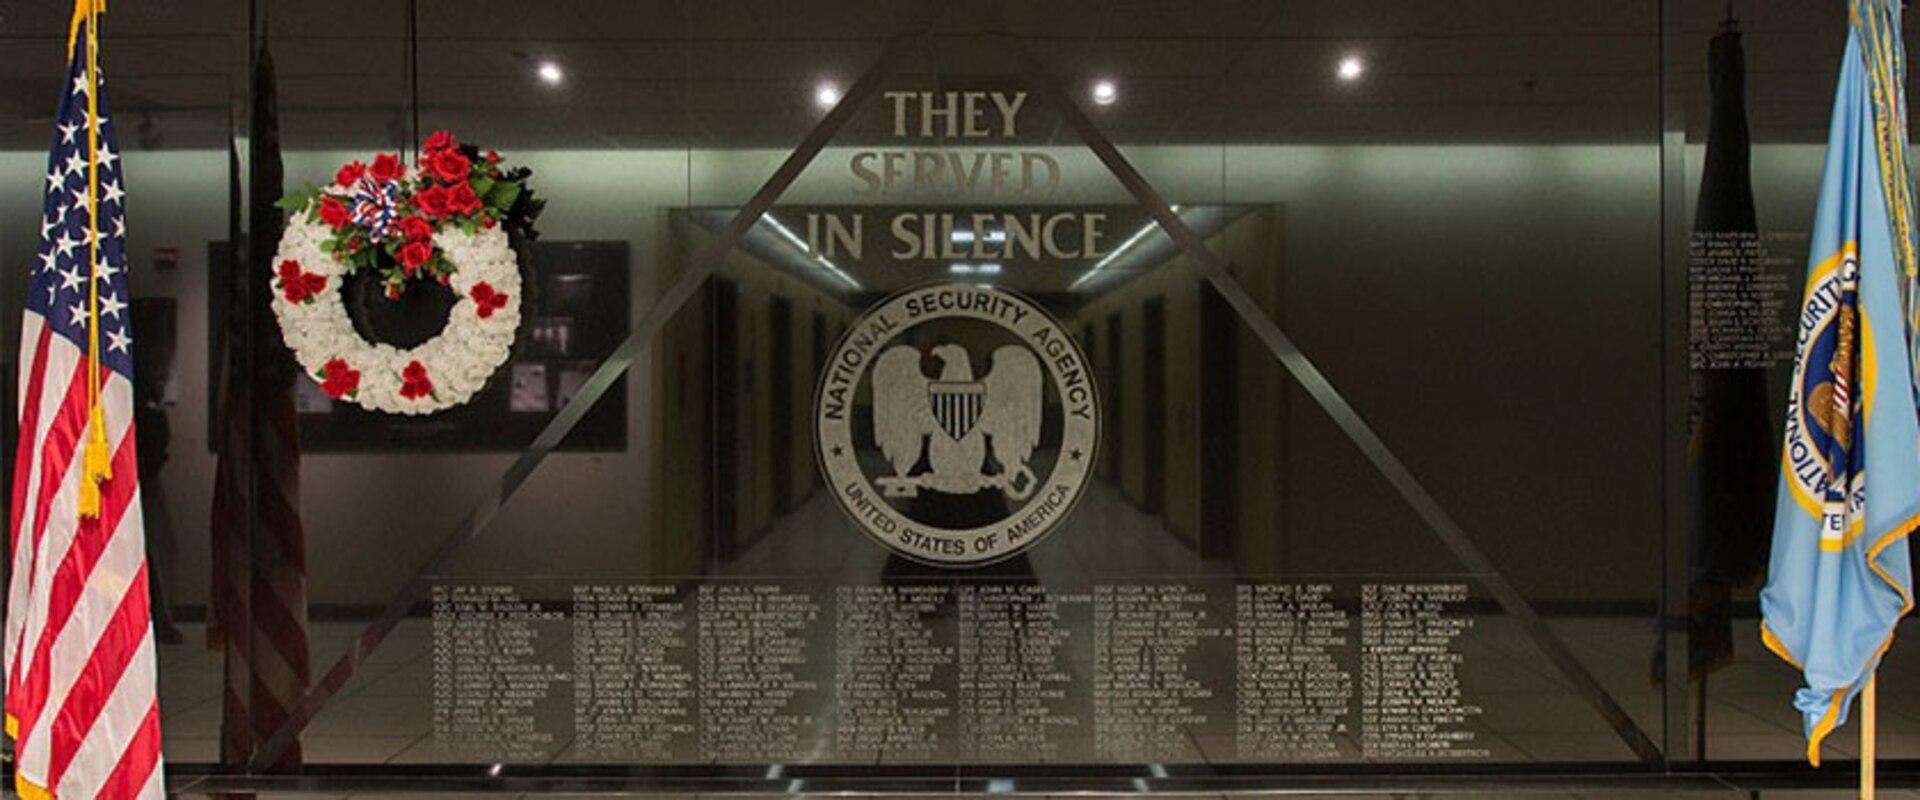 NSA Memorial Wall